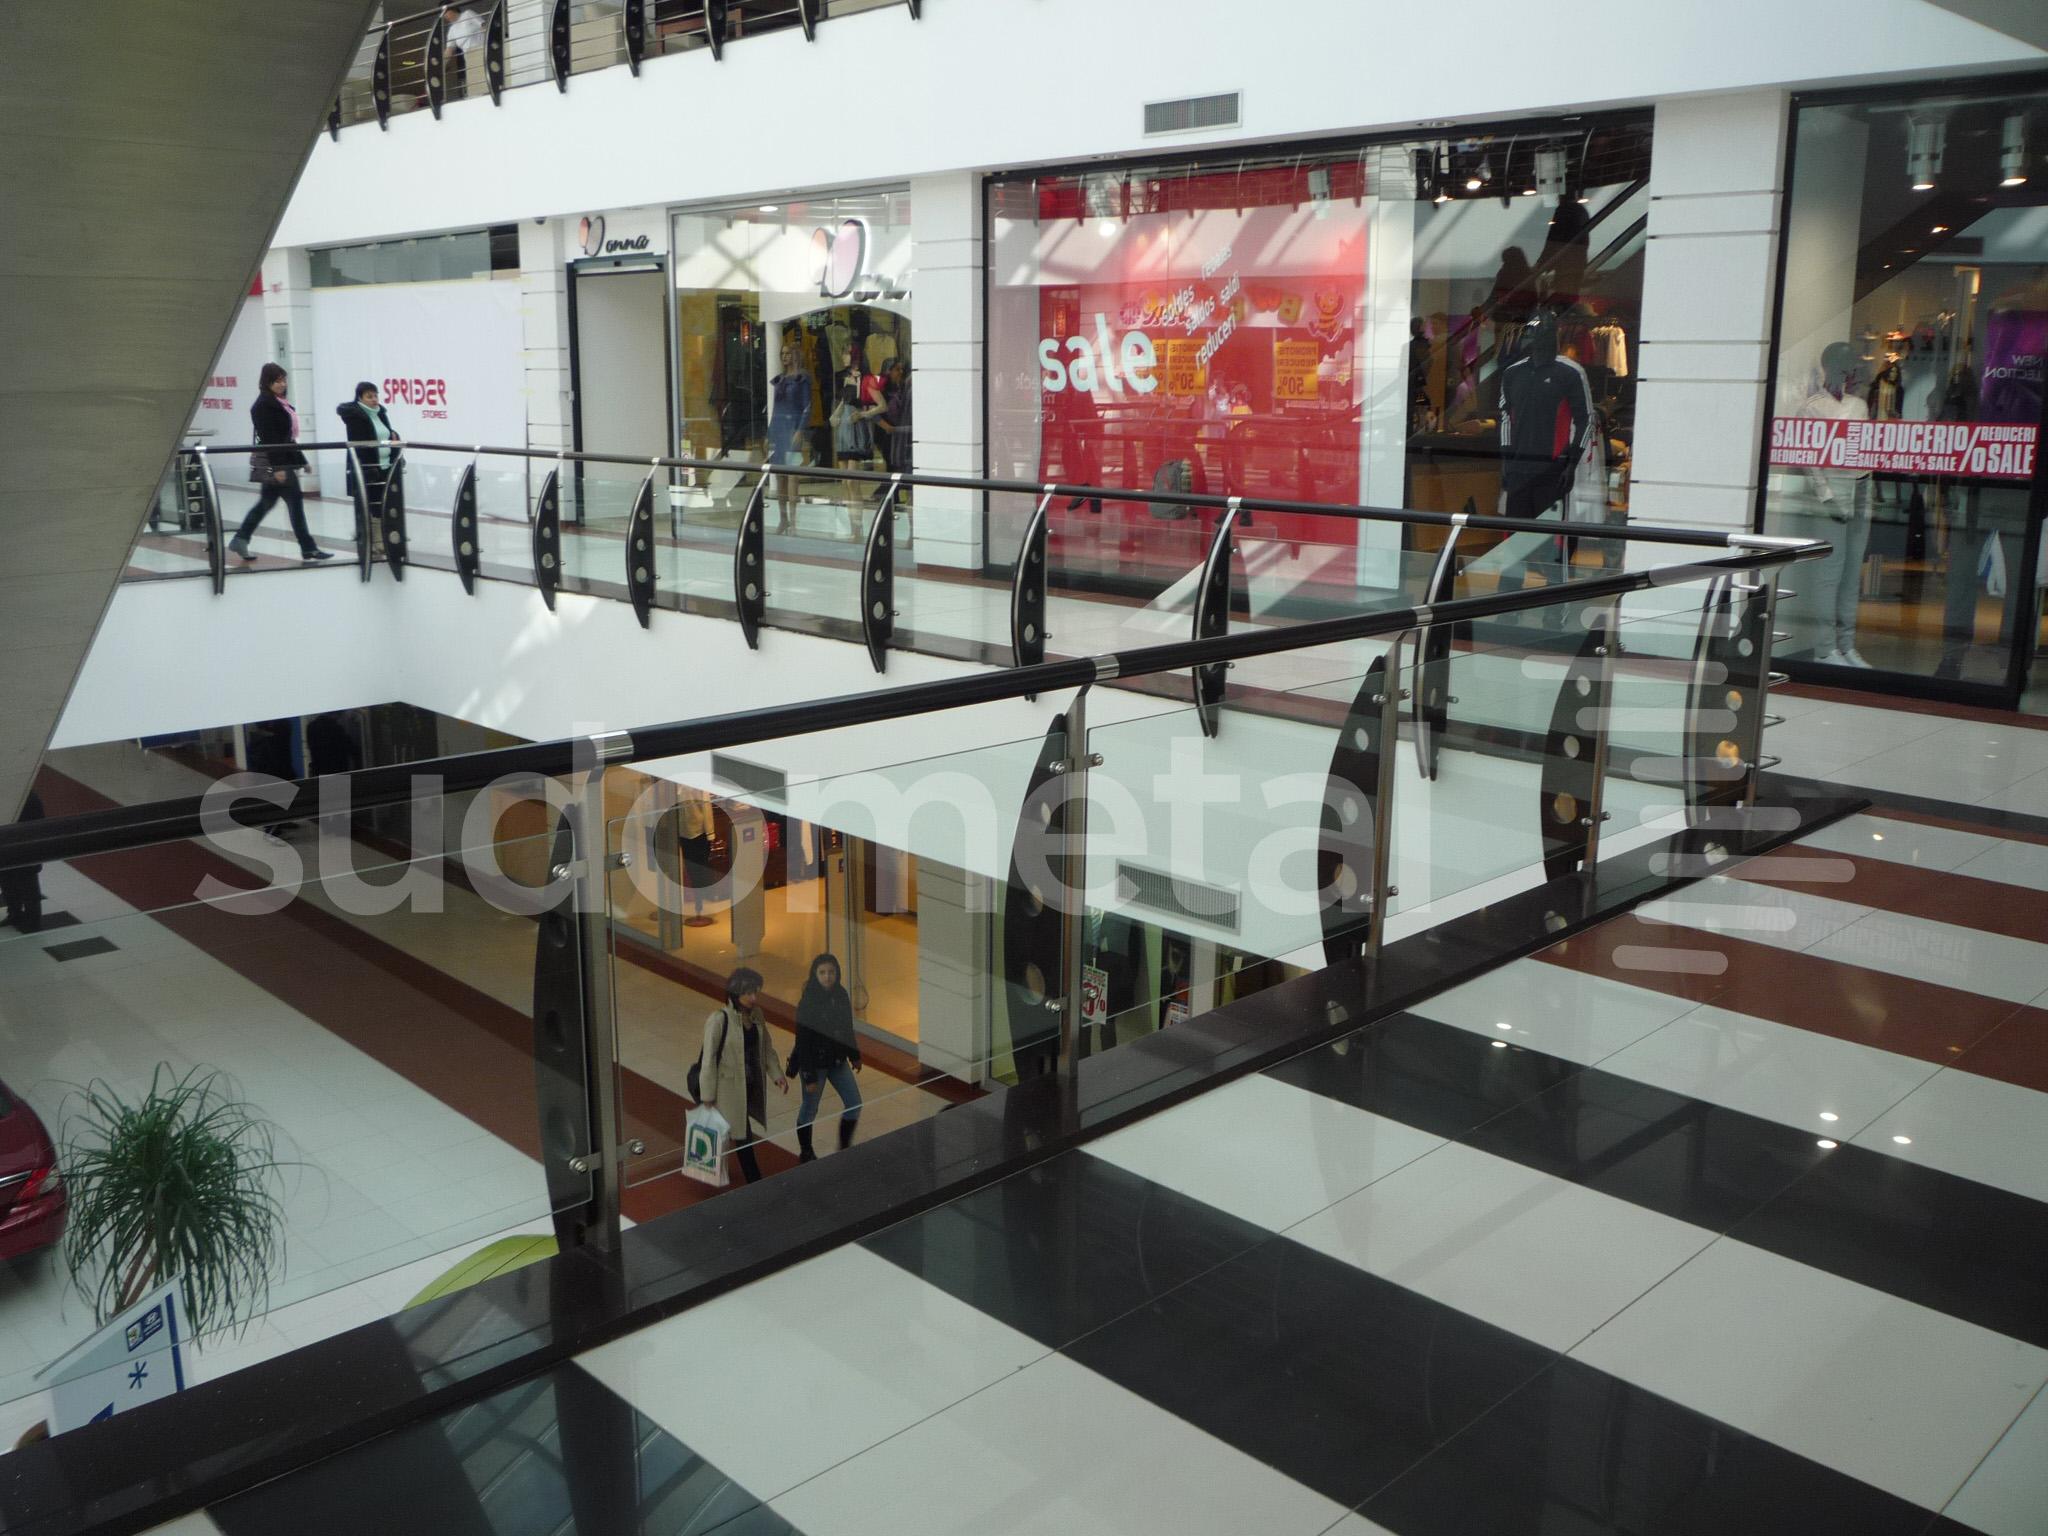 Balustrade din inox-sticla - Balustrade Arena Mall Bacau SUDOMETAL - Poza 4